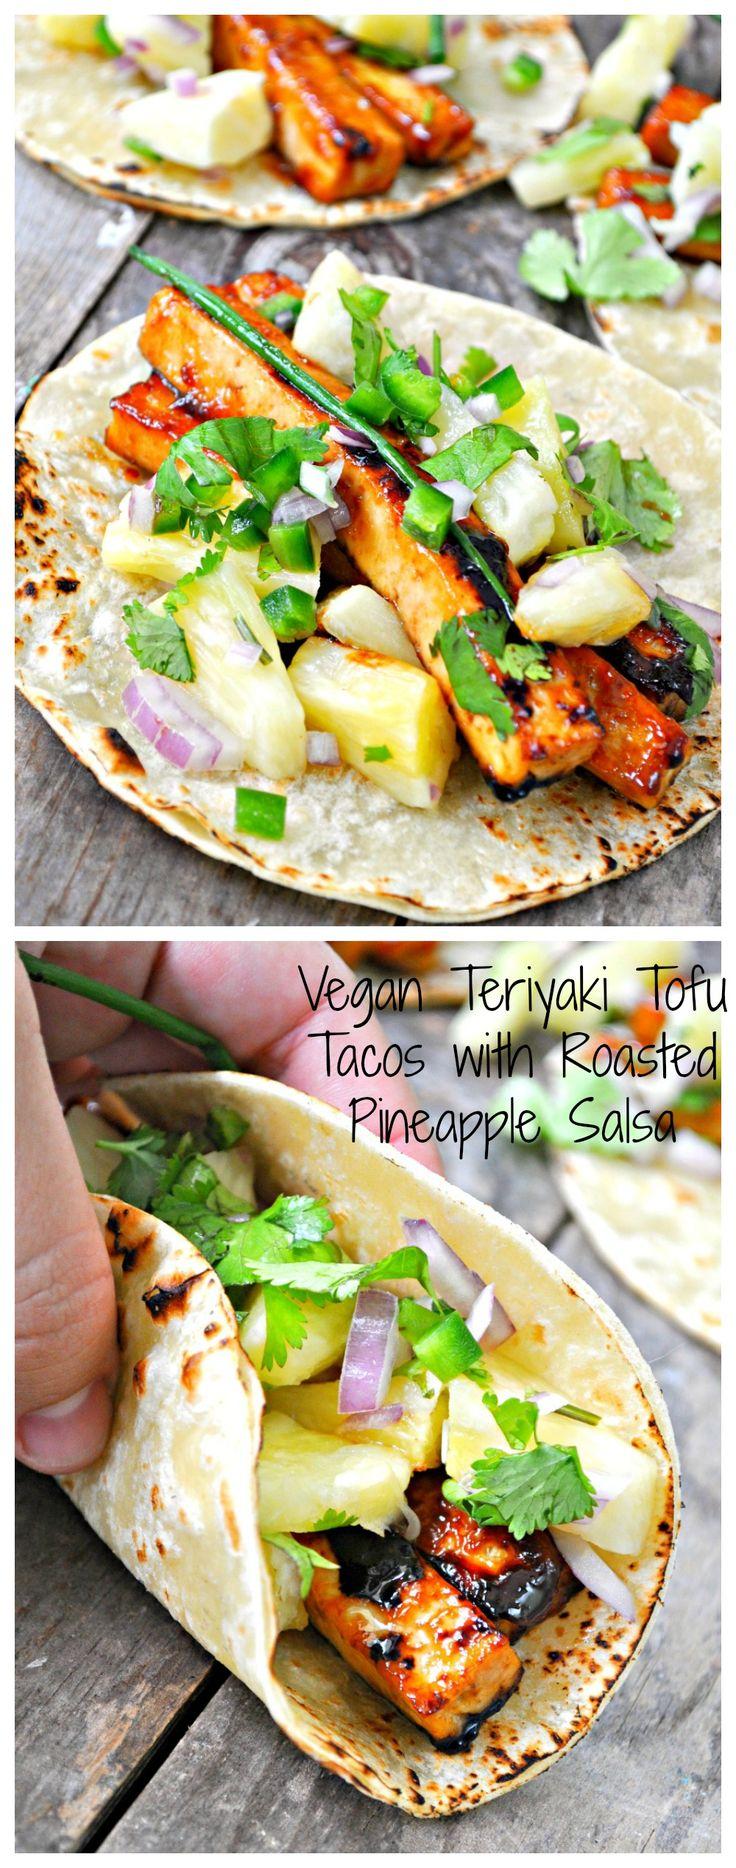 Vegan Teriyaki Tofu Tacos with Roasted Pineapple Salsa (Spicy Roasted Vegetables)